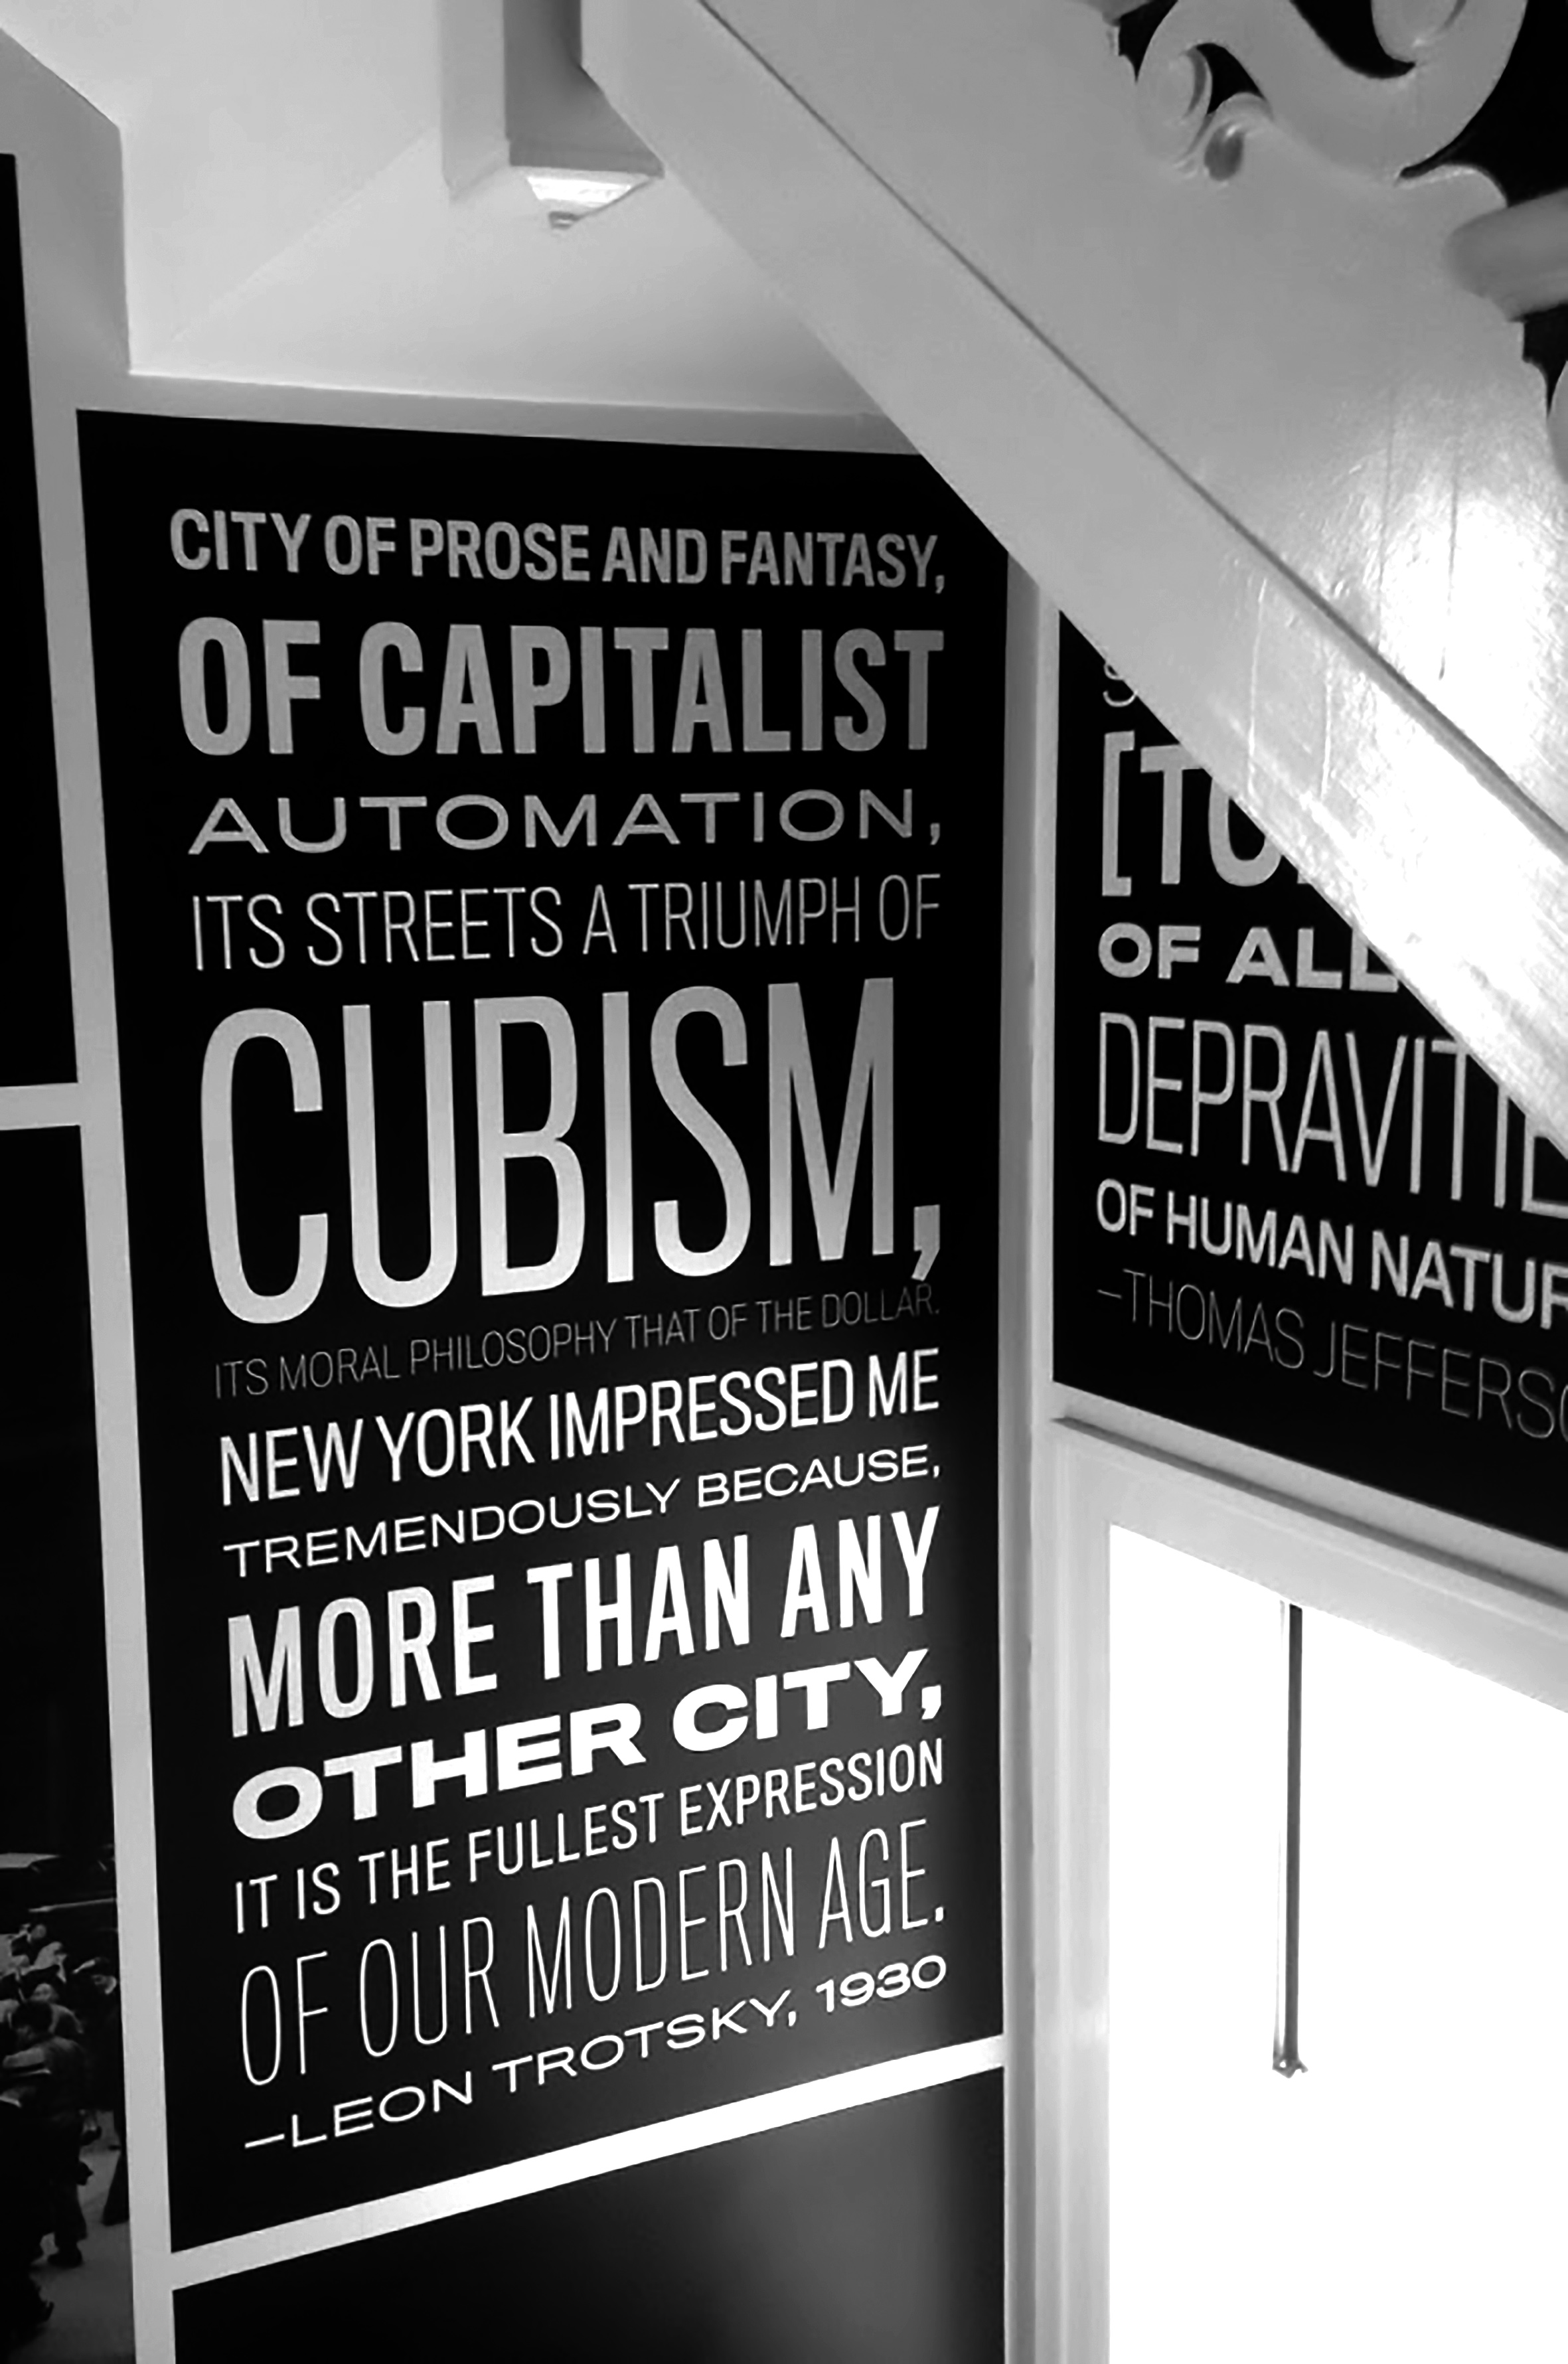 trotsky-quote